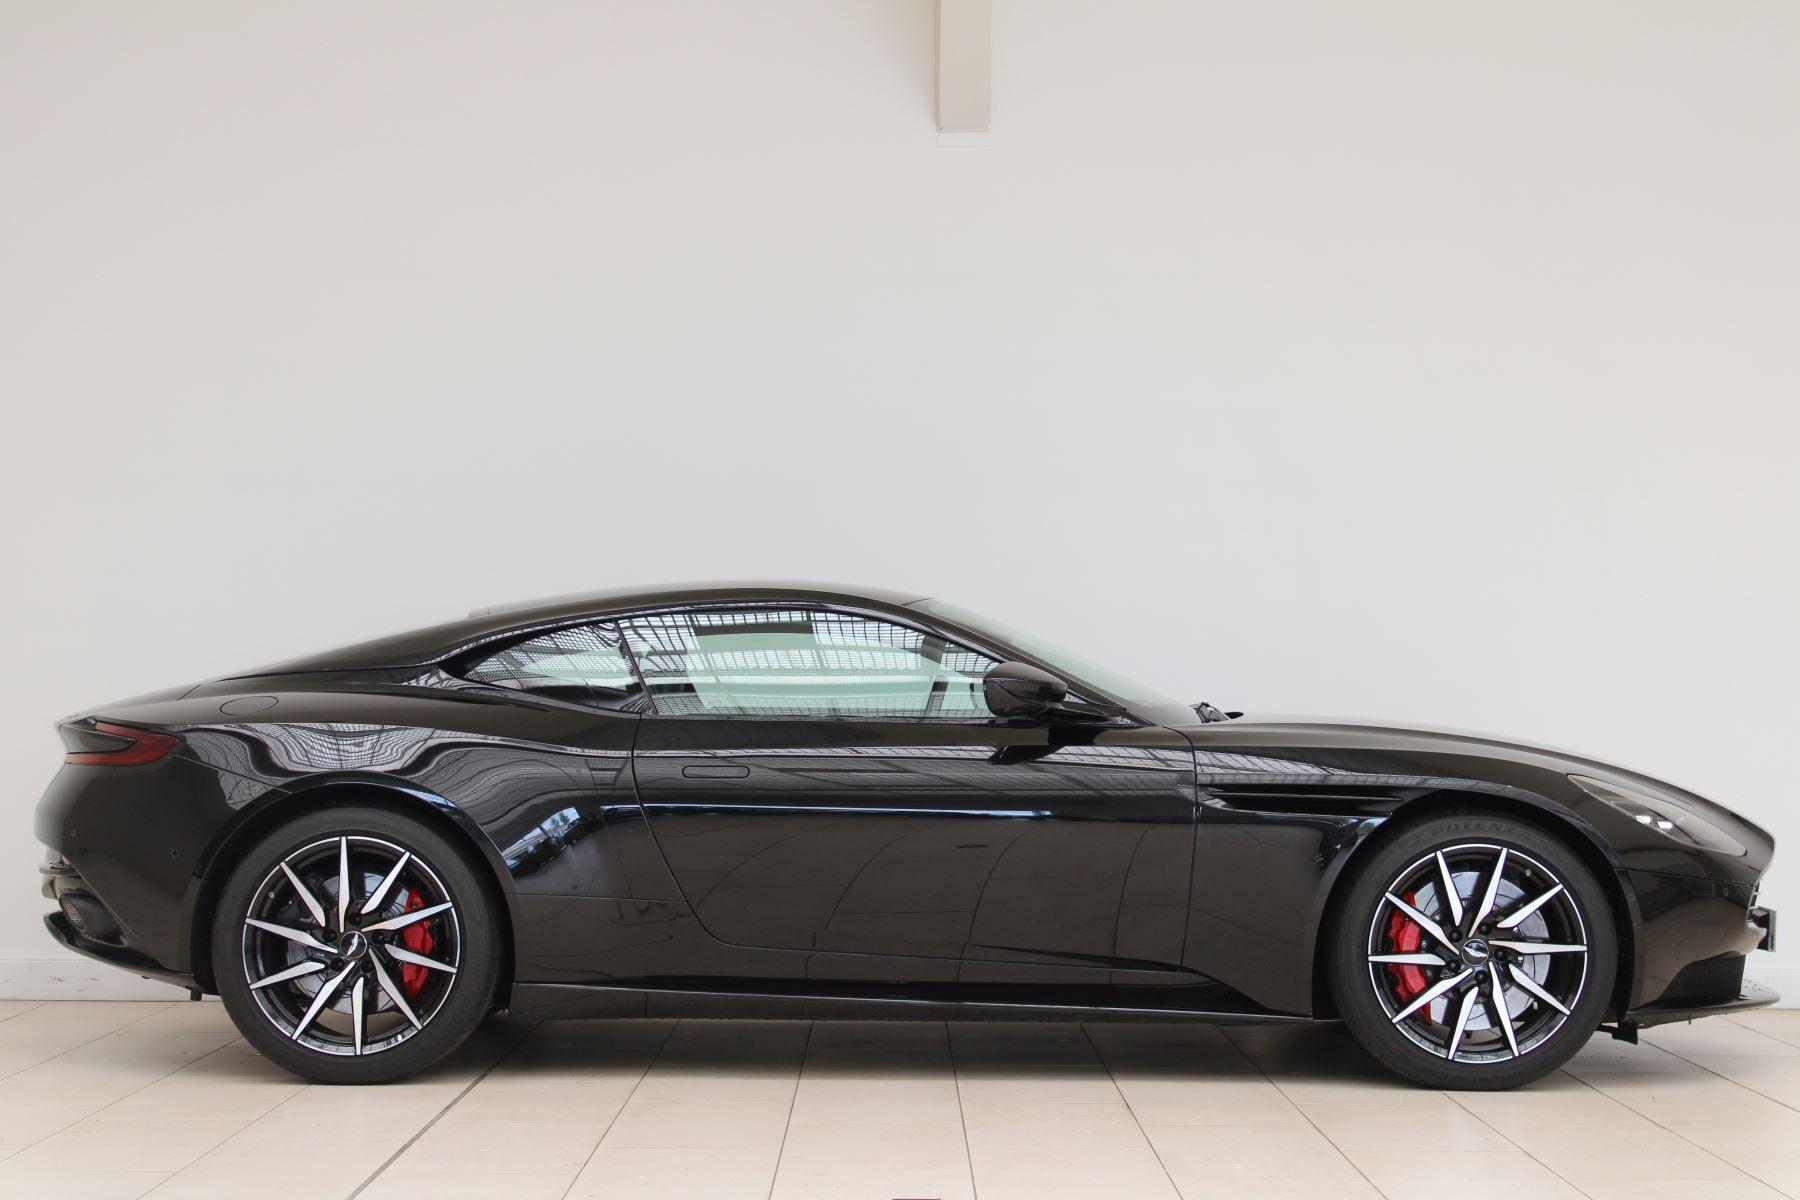 Aston Martin DB11 V8 2dr Touchtronic image 5